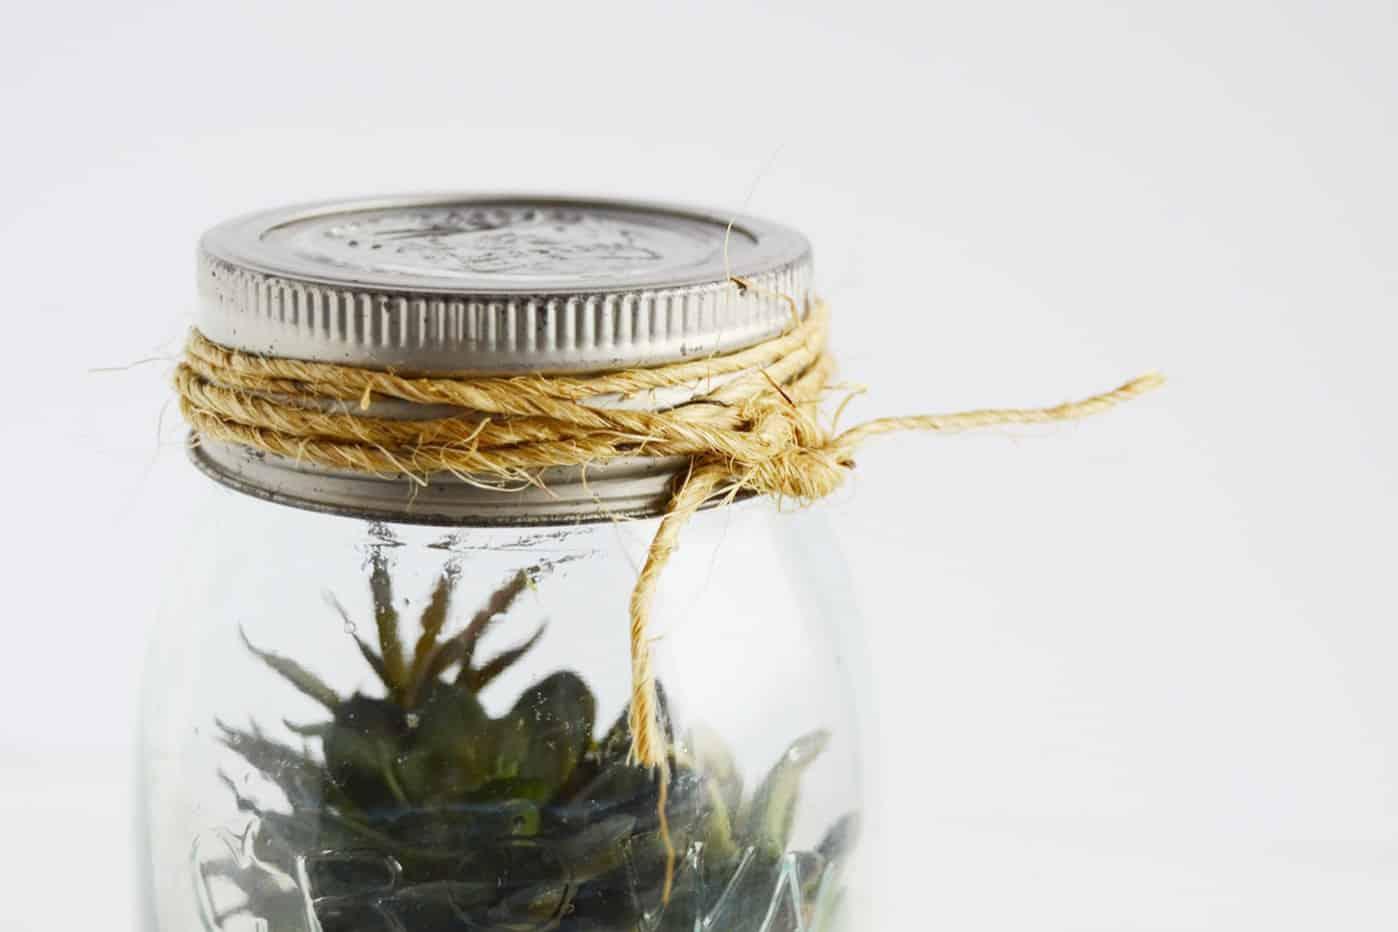 Twine tied around a mason jar lid